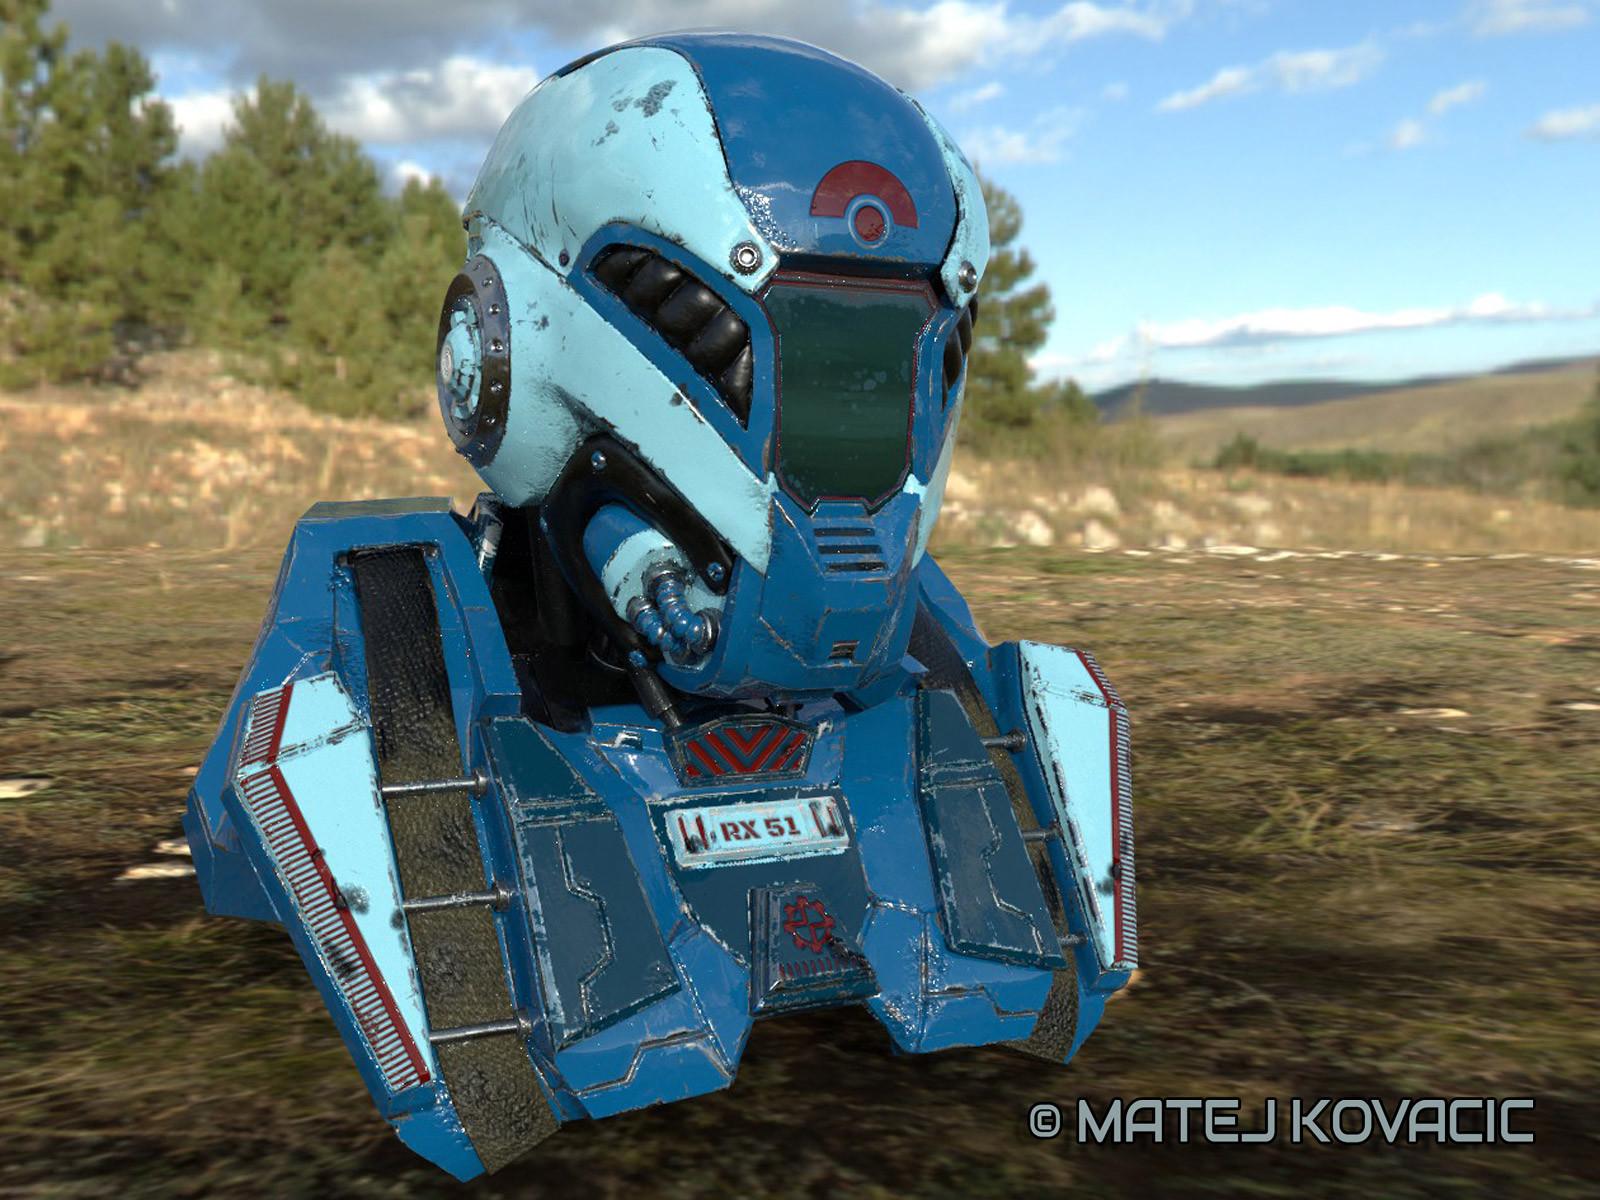 Sci-Fi Helmet RX 51 Substance Painter